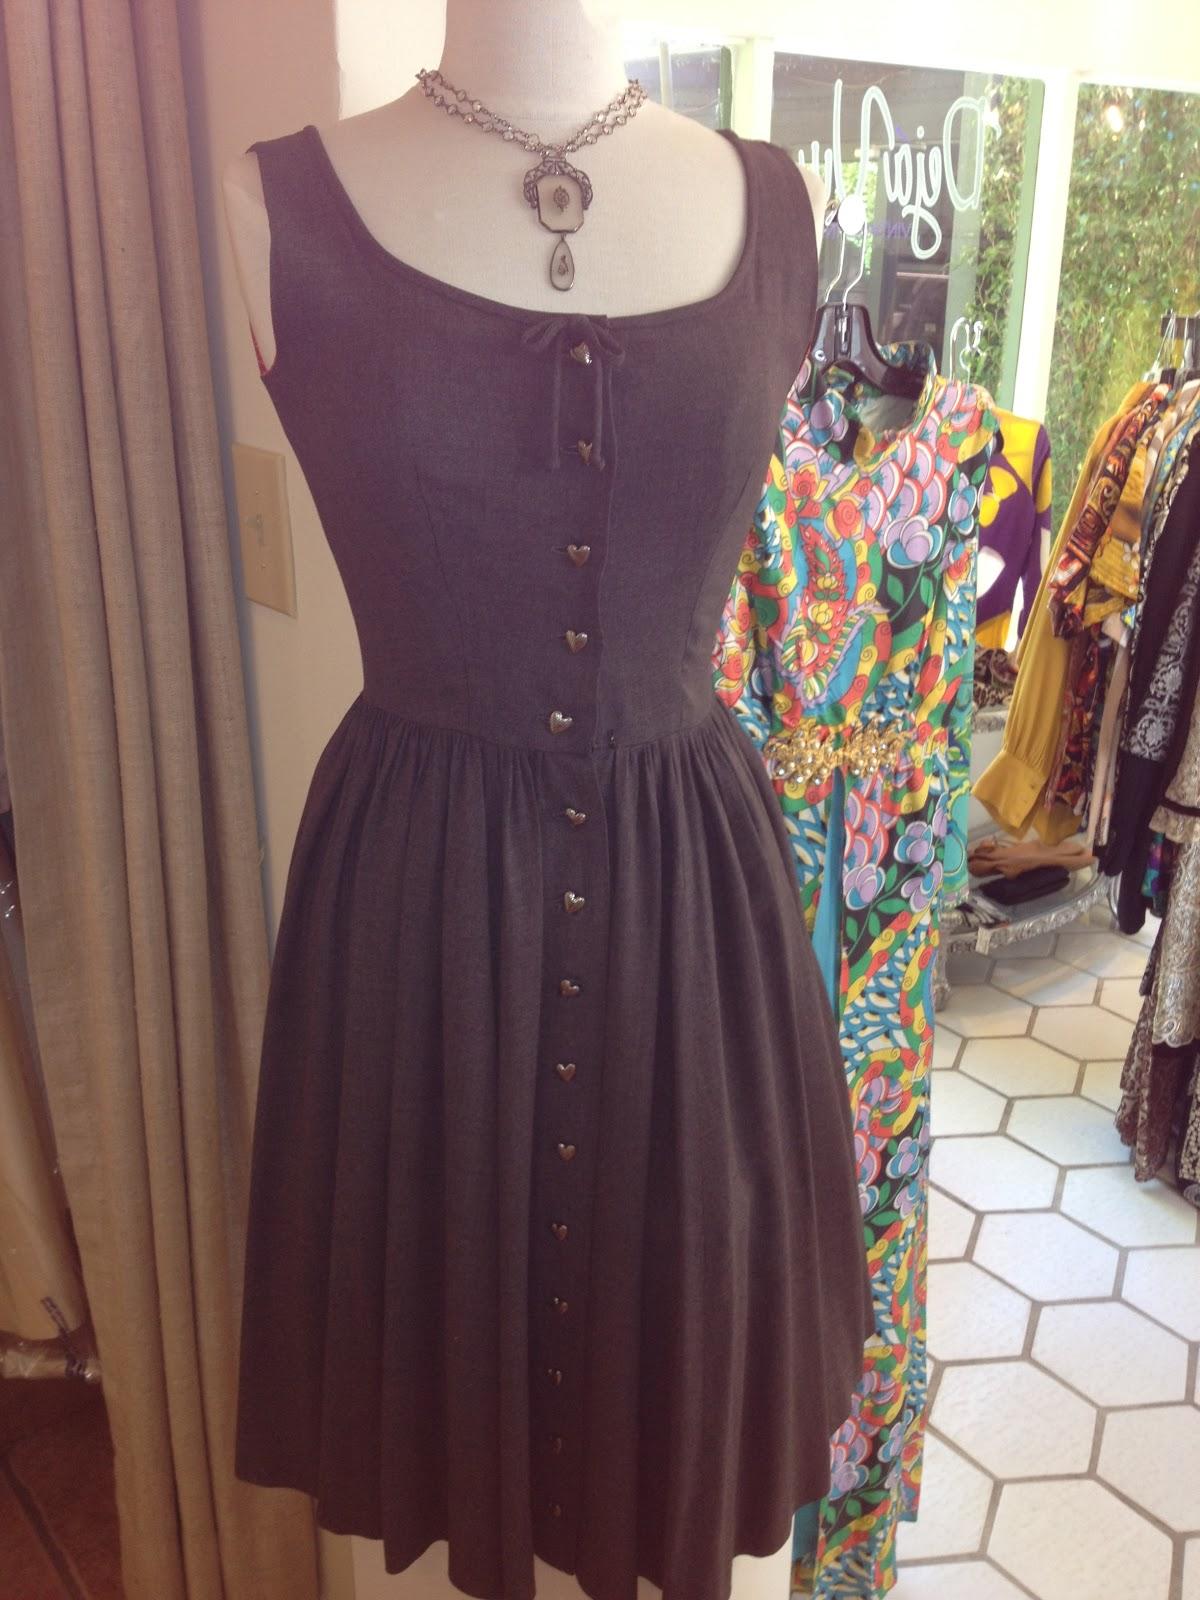 Déjà Vu Vintage Finery: Palm Springs Vintage Clothing: \